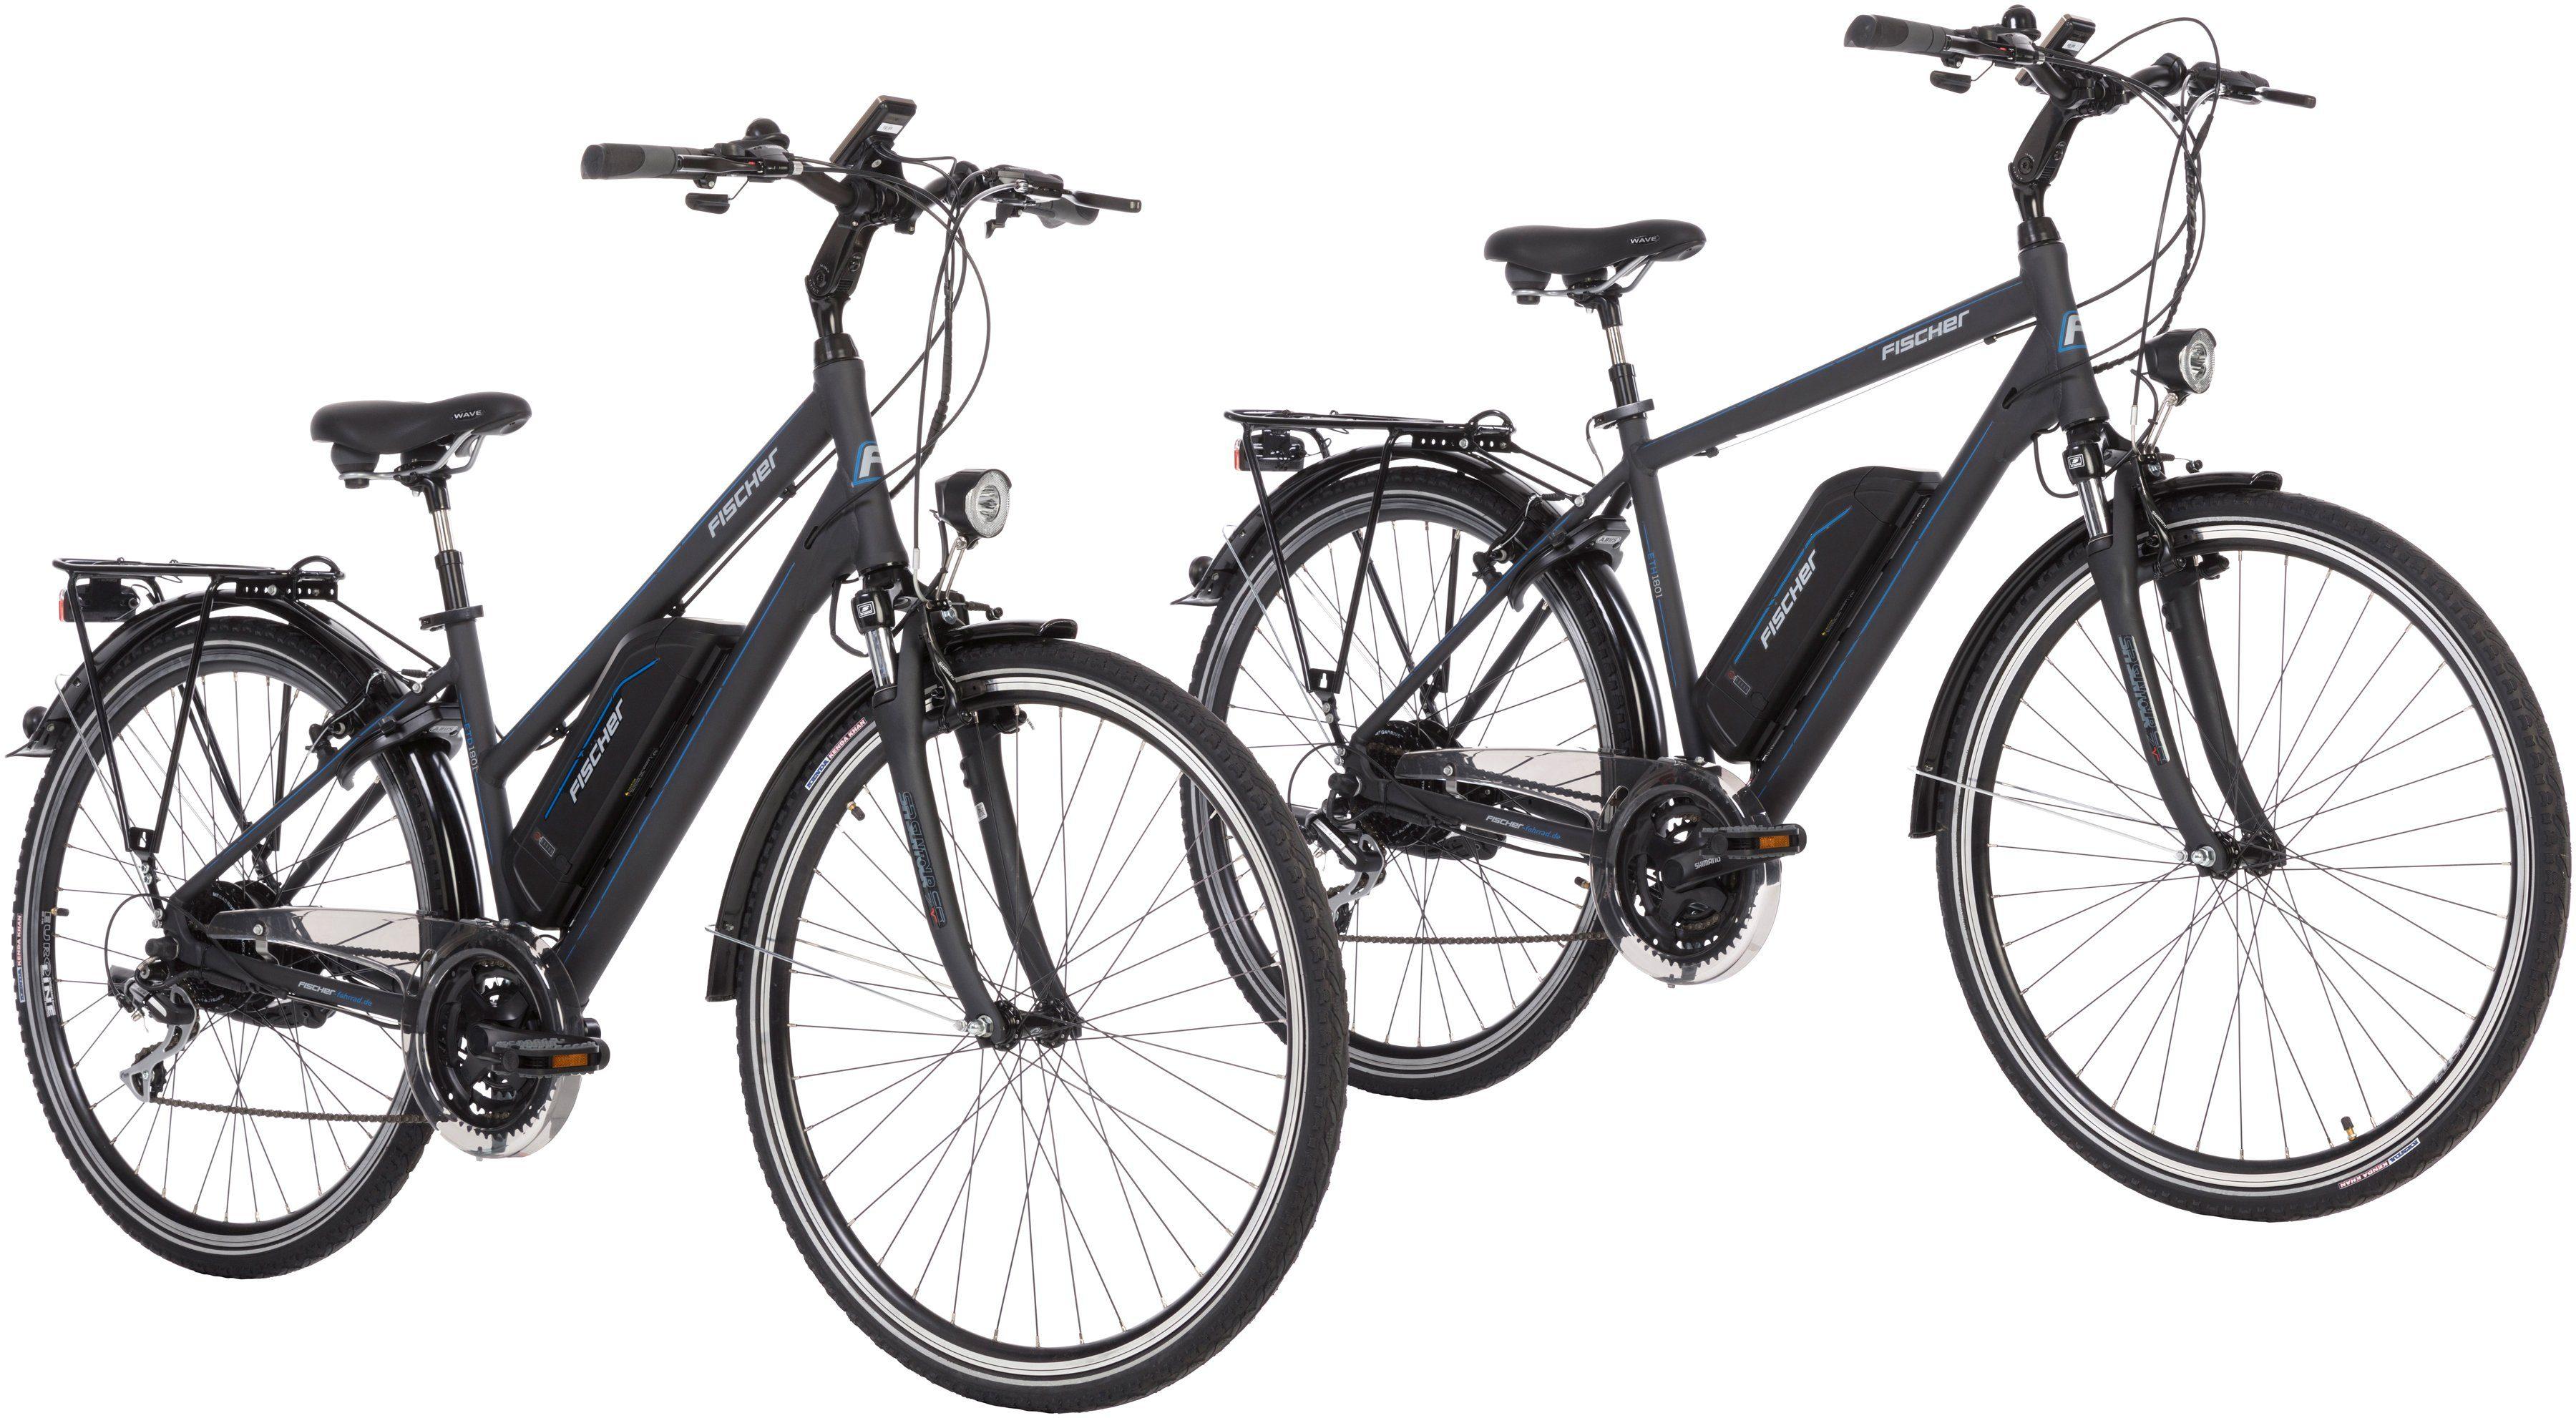 FISCHER FAHRRAEDER Set: E-Bike Trekking »ETD/ETH-1801«, 28 Zoll, 24 Gänge, Damen + Herren